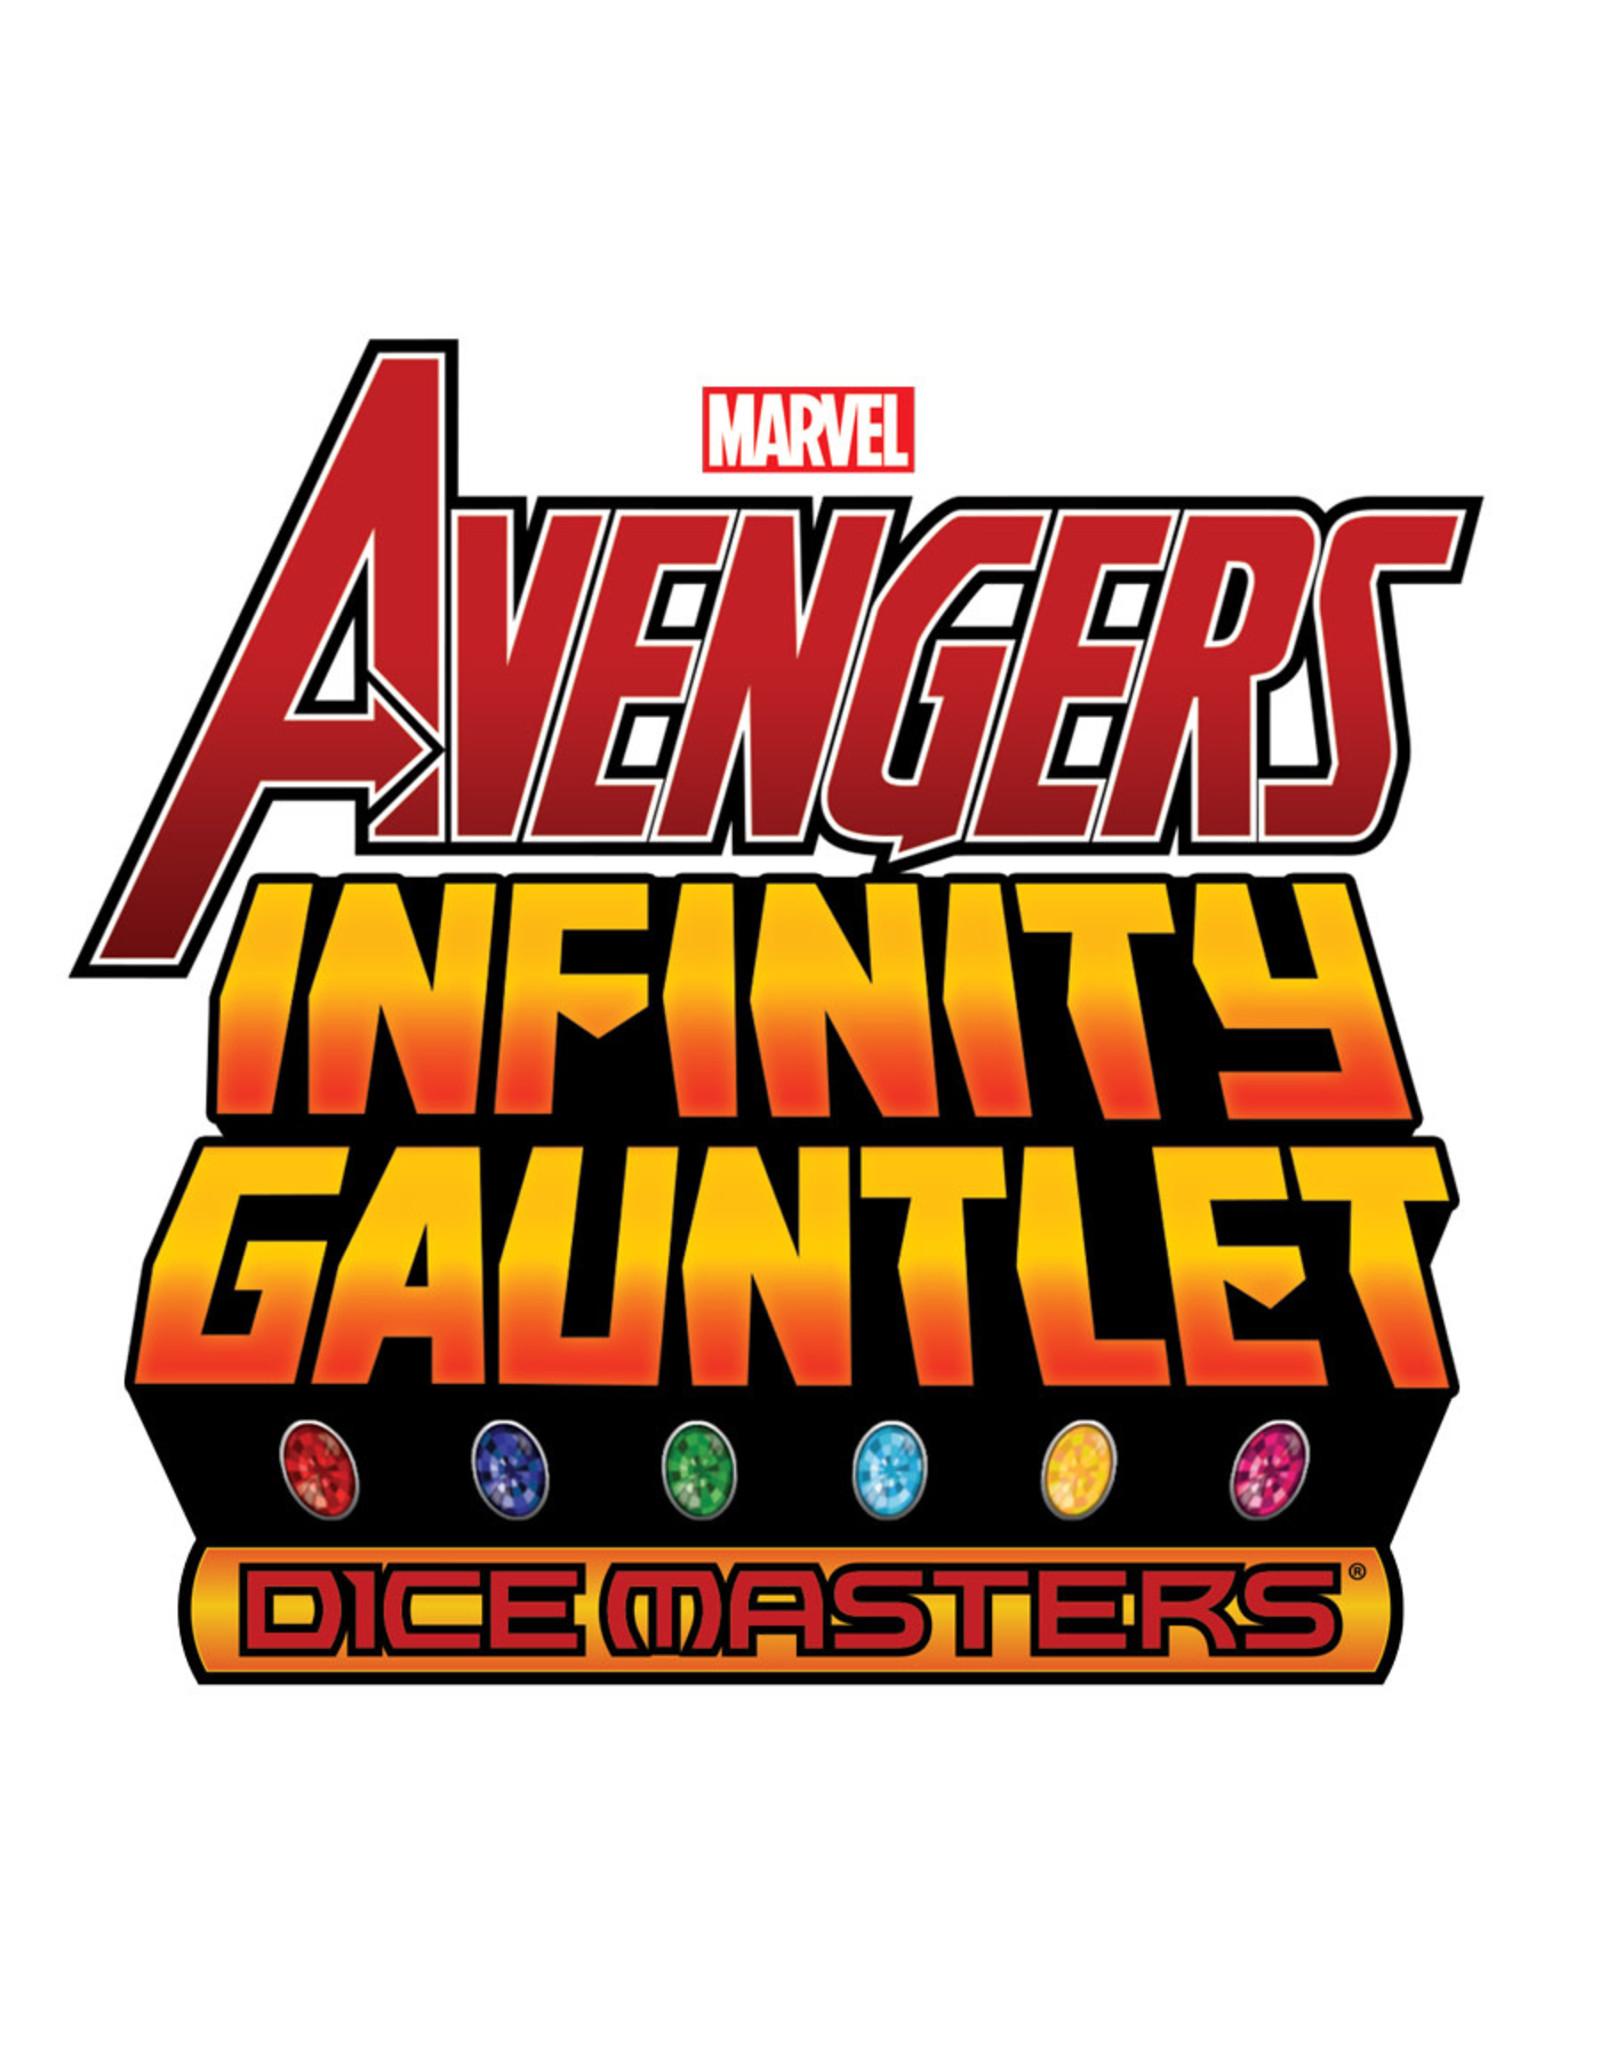 WizKids Marvel Dice Masters: Avengers Infinity Gauntlet Draft Pack